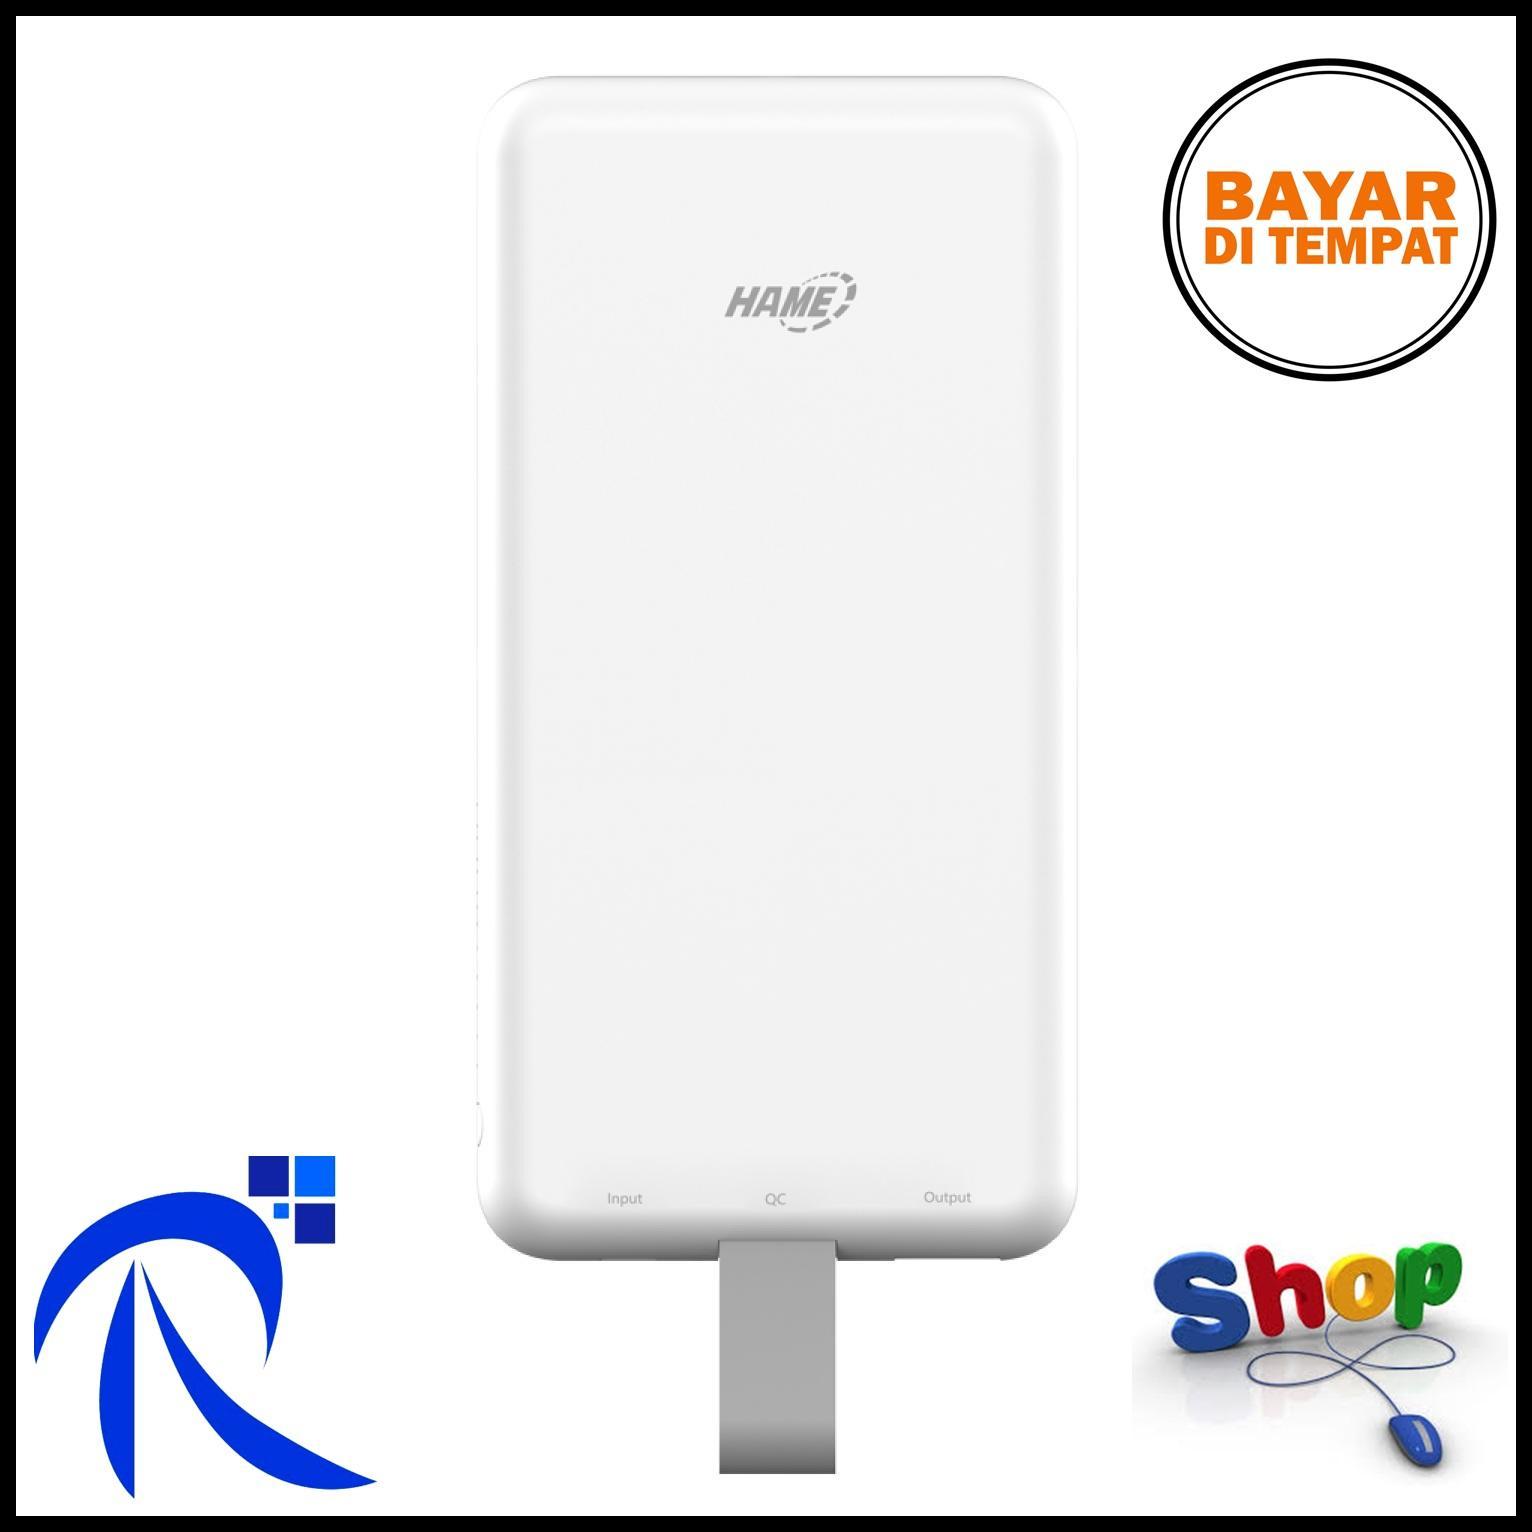 Buy Sell Cheapest Powerbank Original 8000mah Best Quality Product Vivan M8 8000 Mah 100 Hame Power Bank Built In Micro Usb Qc3 Cable P1